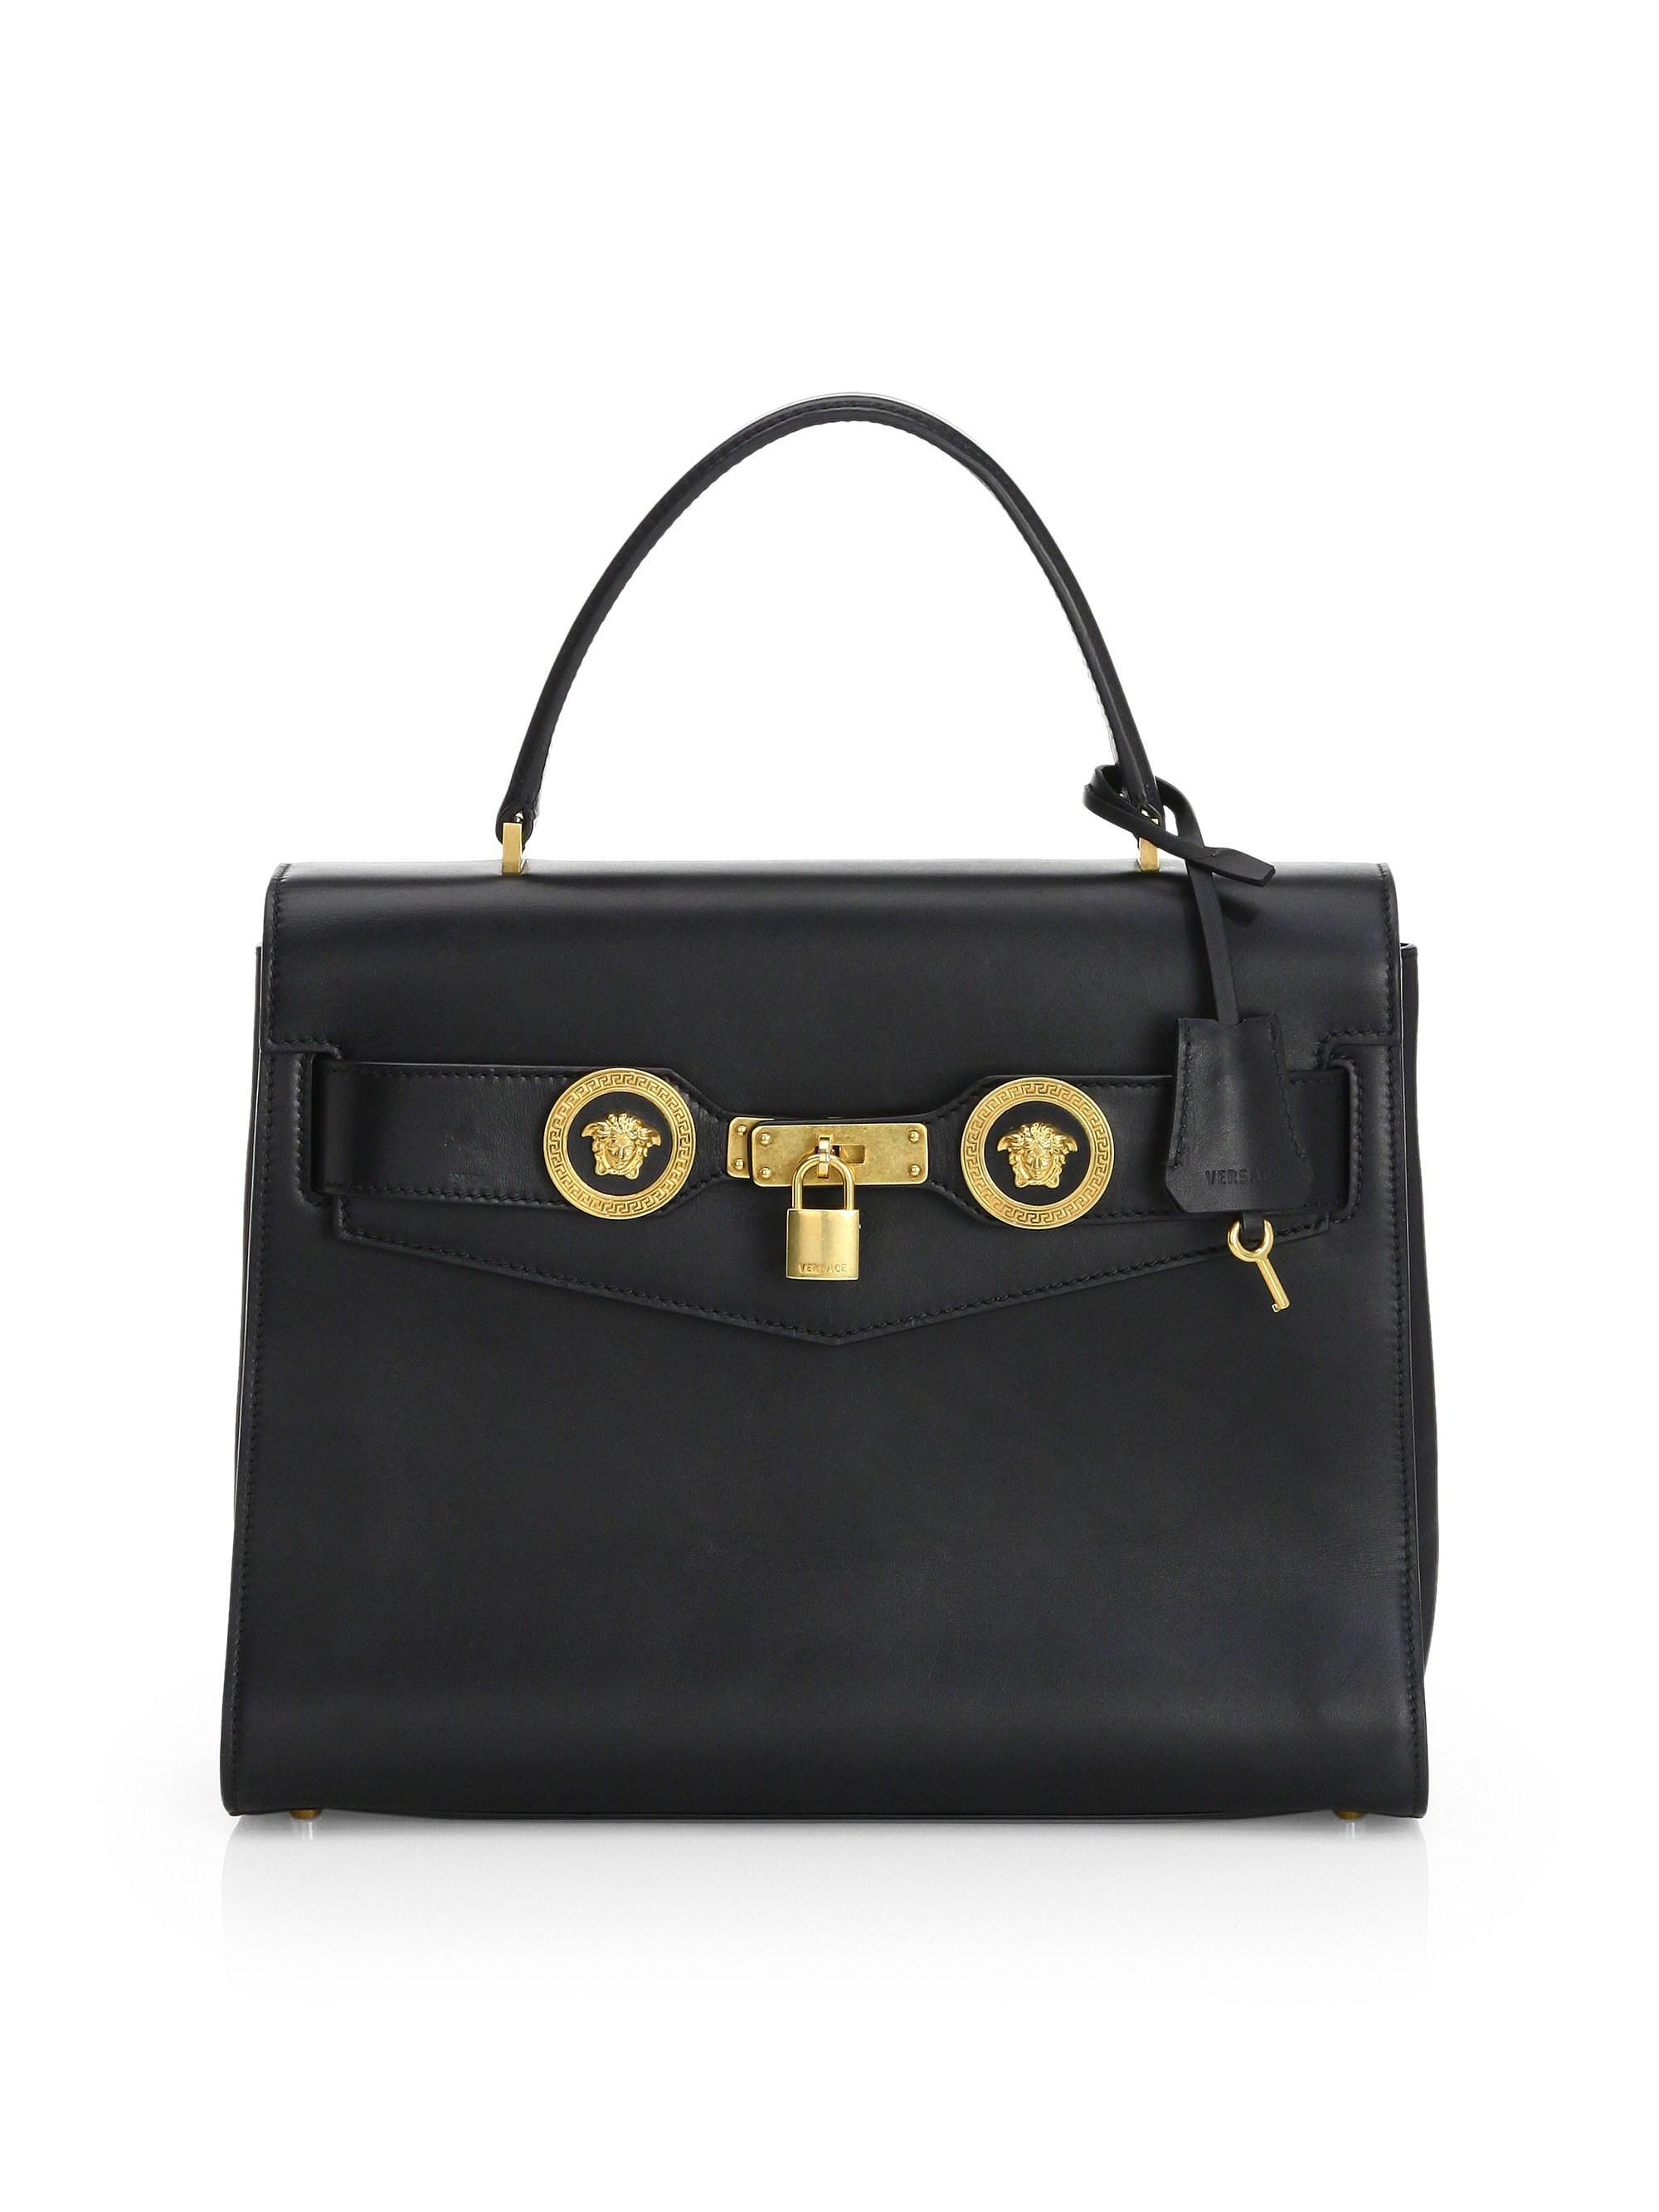 5eeafd85e2f3 Versace - Women s Icon Leather Satchel Bag - Black Gold - Lyst. View  fullscreen